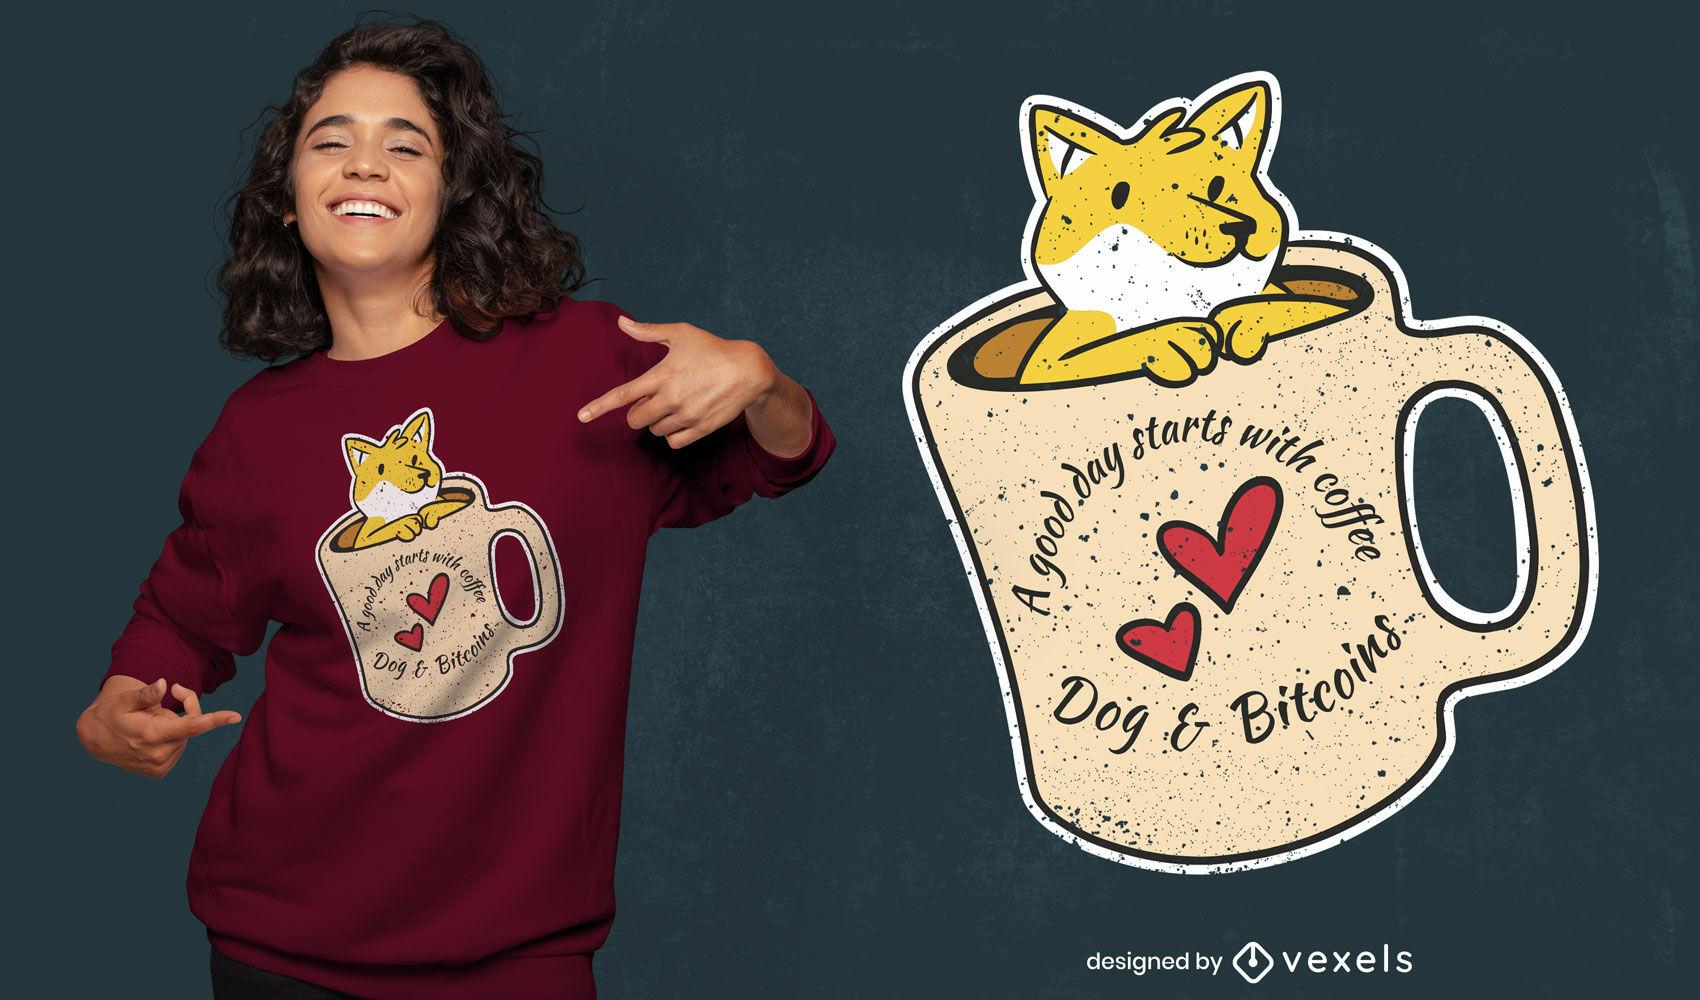 Dise?o de camiseta Coffee Dog y Bitcoins.